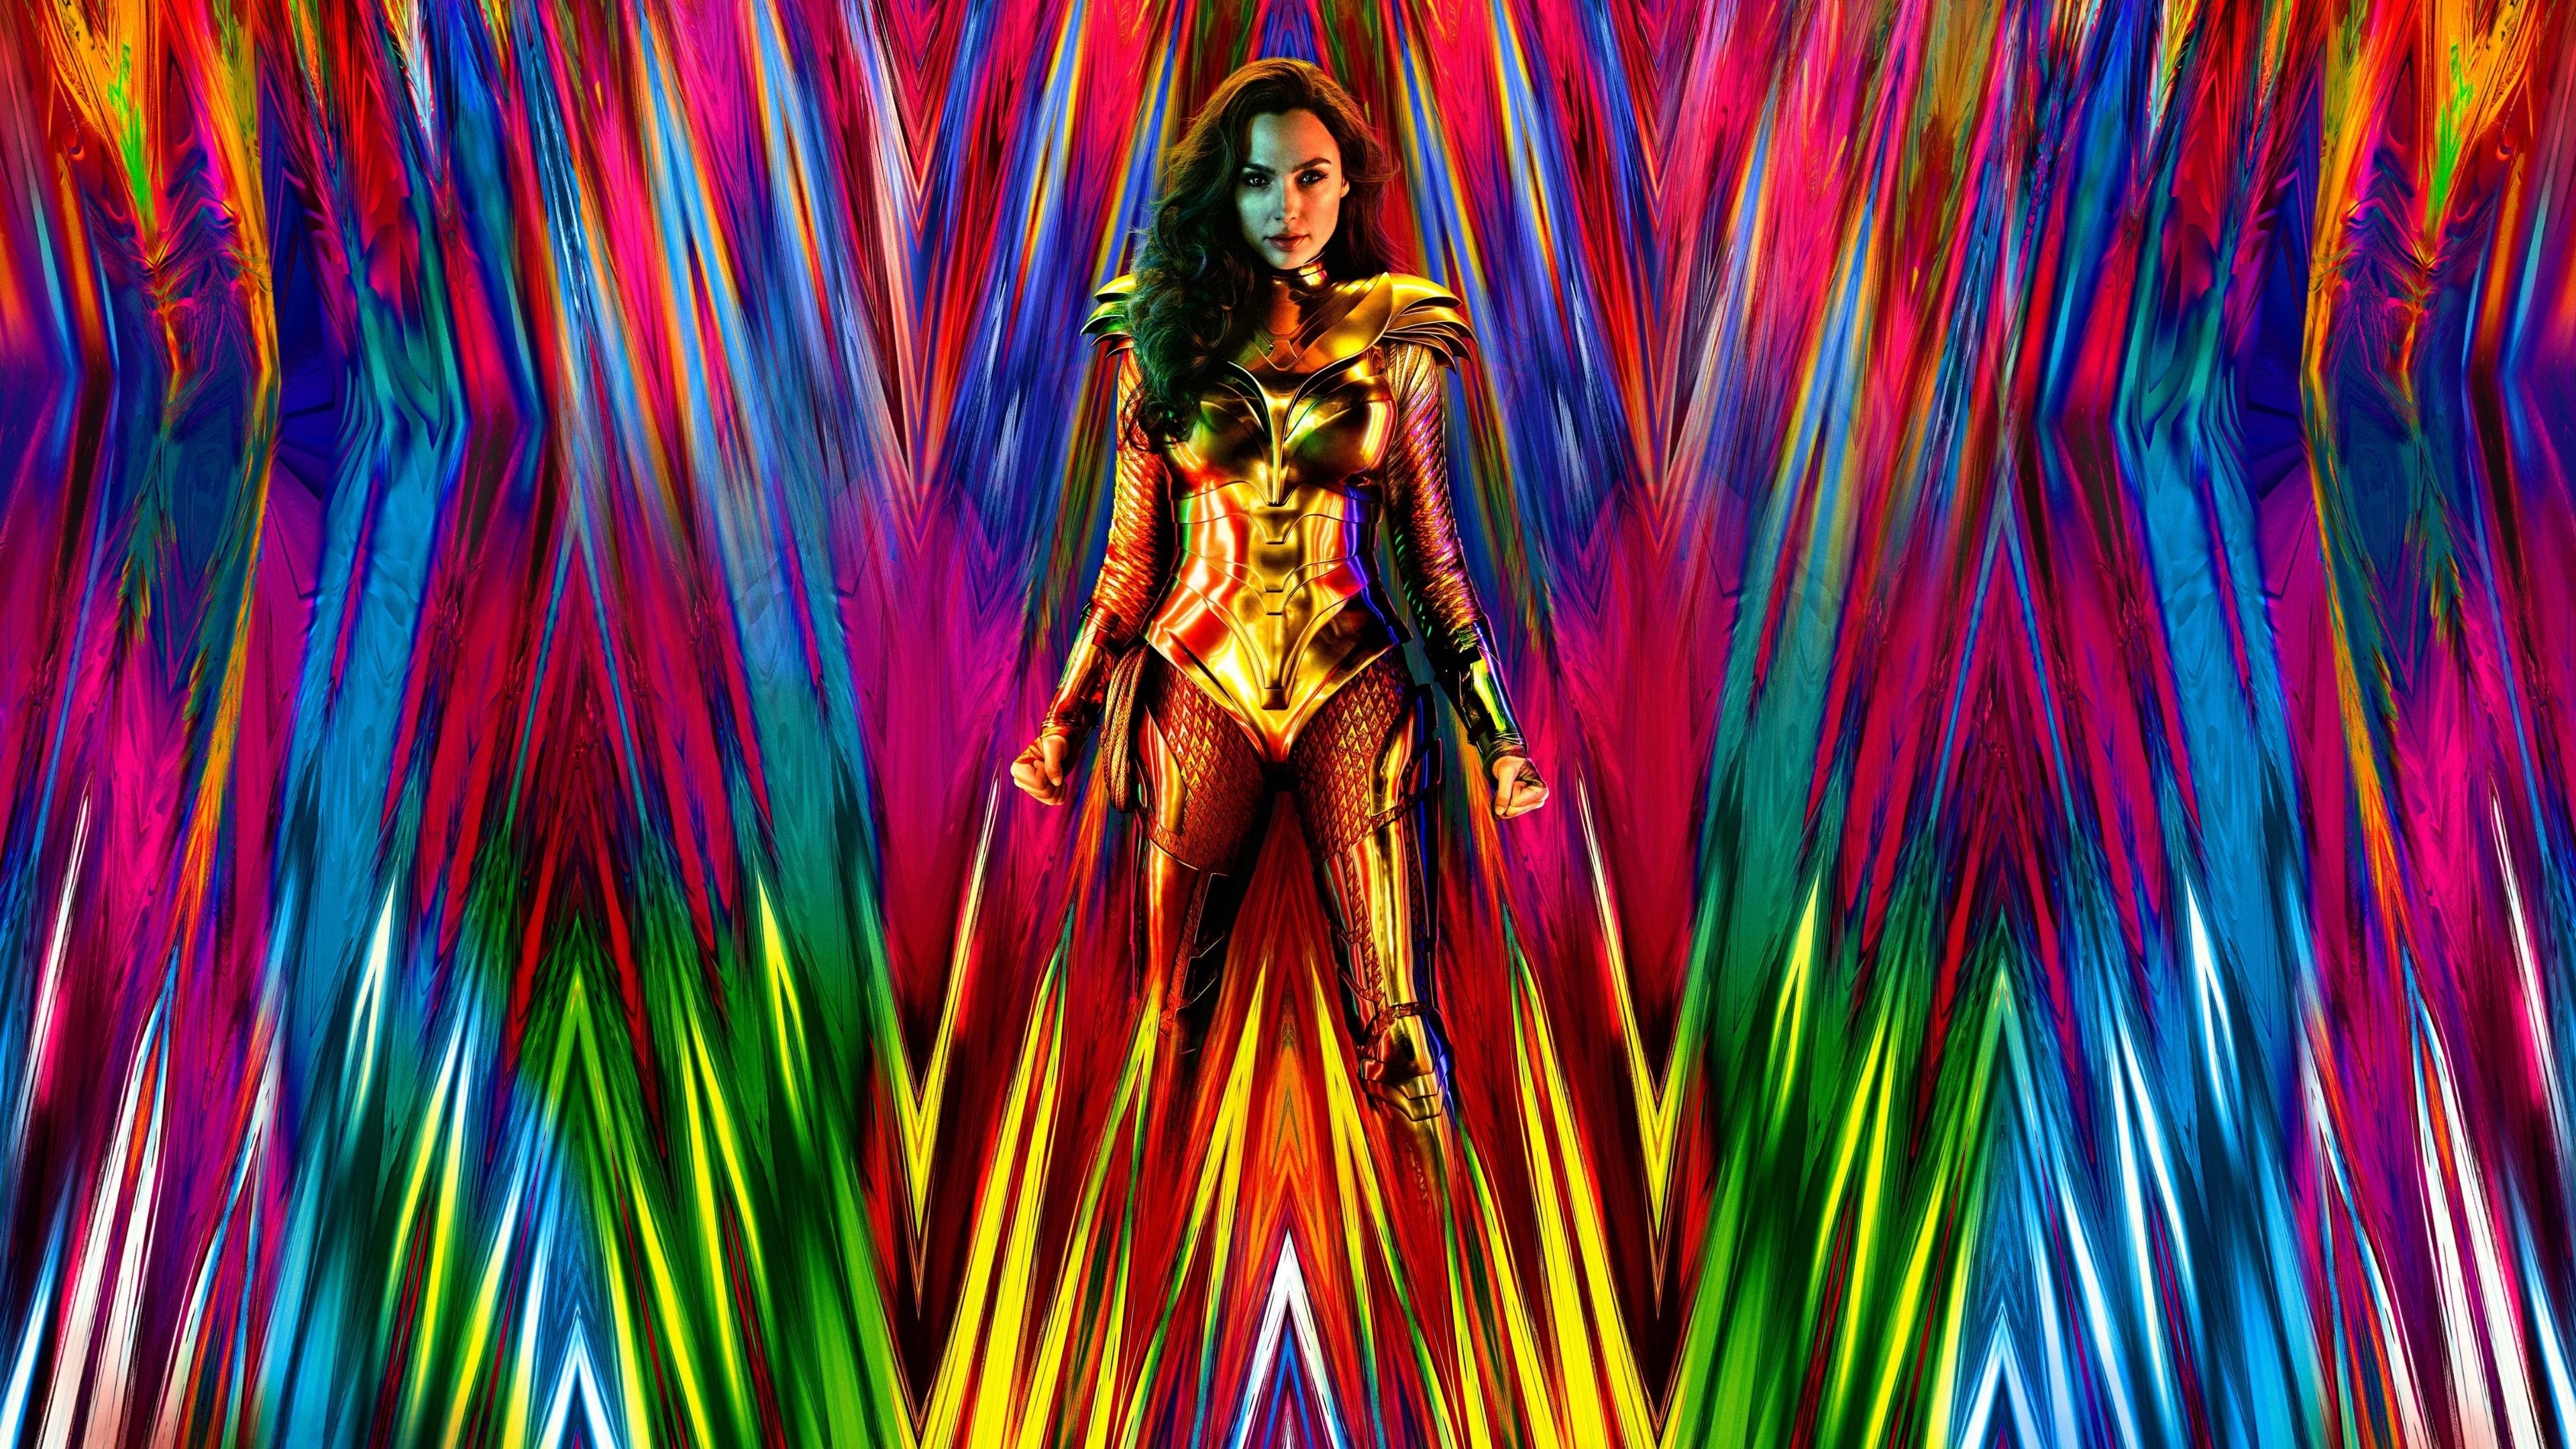 Wallpaper 4k Wonder Woman 1984 2020 movies wallpapers 4k 3840x2160